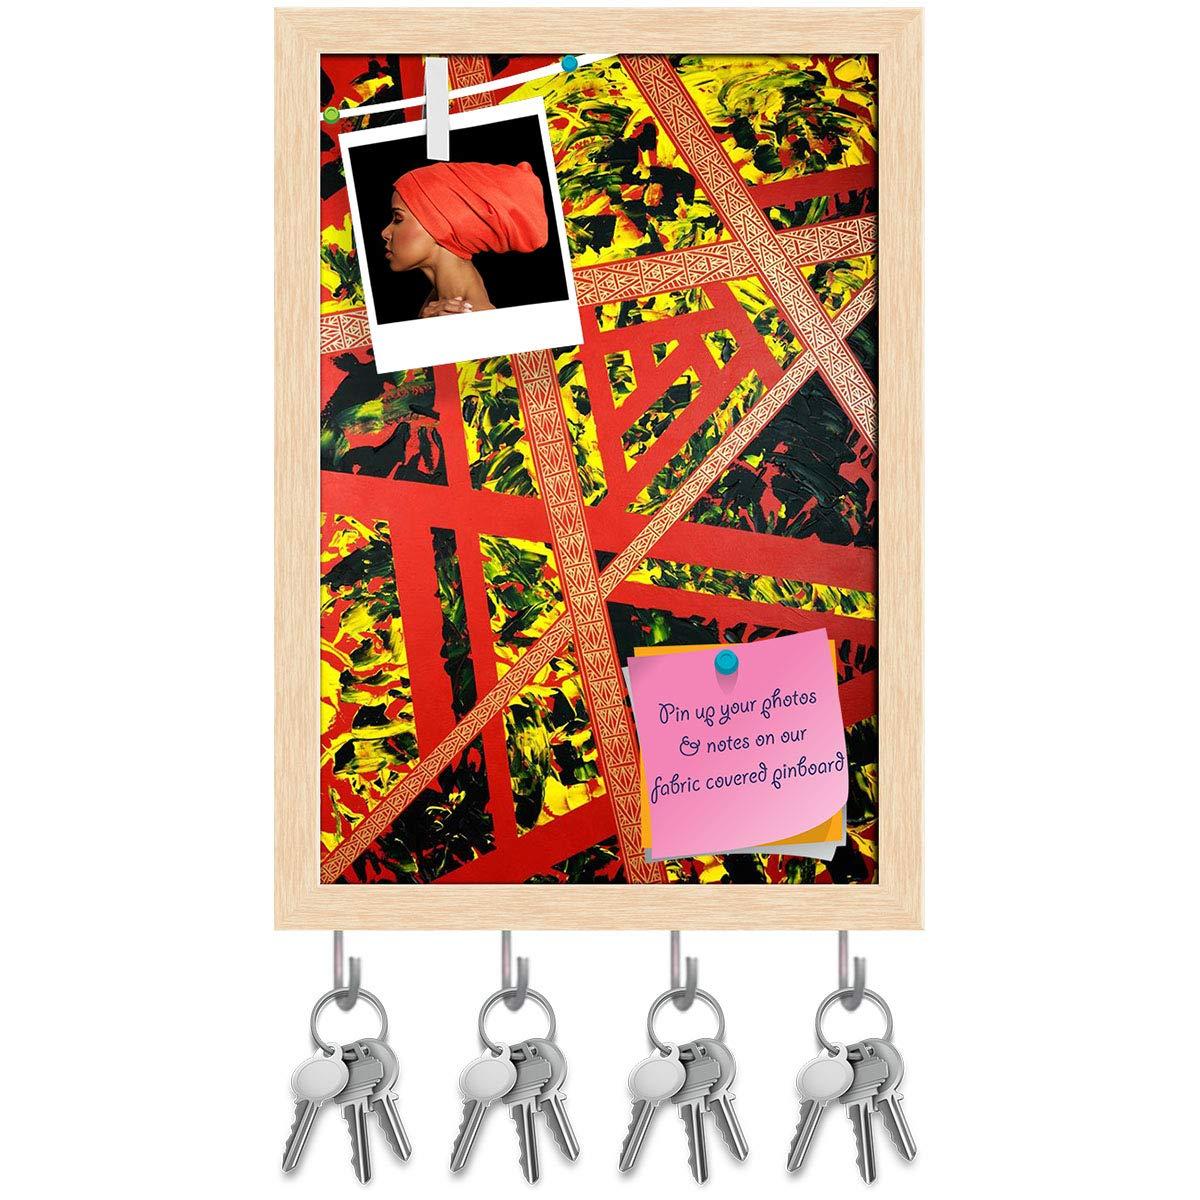 Natural Brown Frame 12inch x 17.4inch (30.5cms x 44.2cms) Artzfolio Geometrical Artwork Key Holder Hooks   Notice Pin Board   Antique golden Frame 12 X 17.4Inch